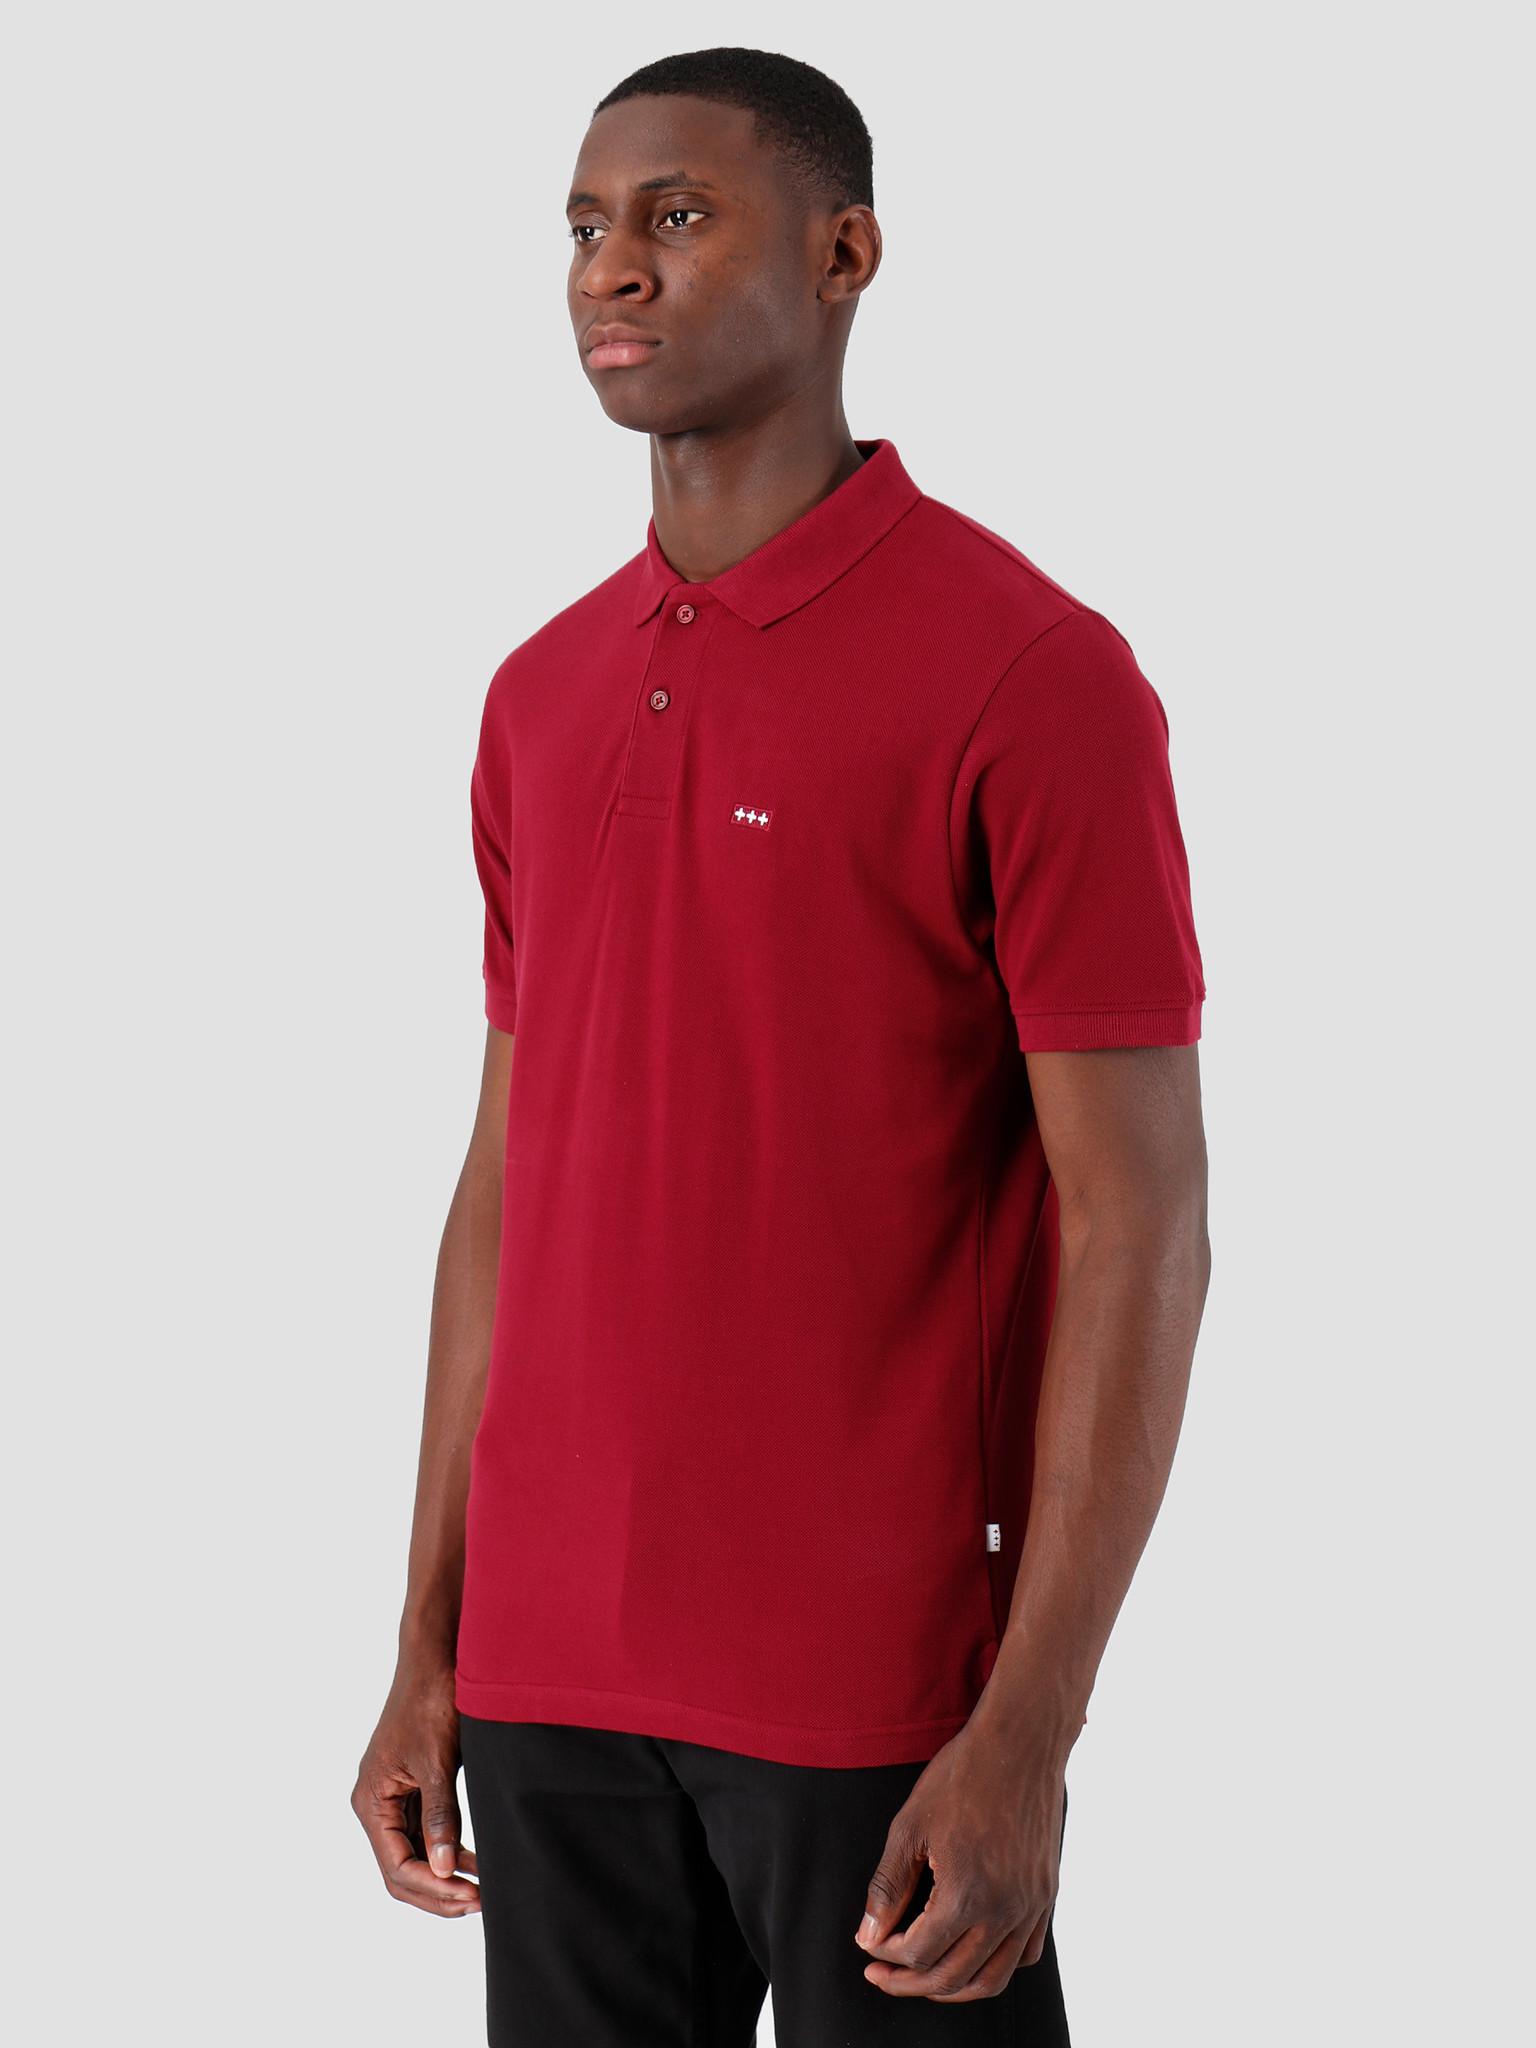 Quality Blanks Quality Blanks QB50 Polo Burgundy Red